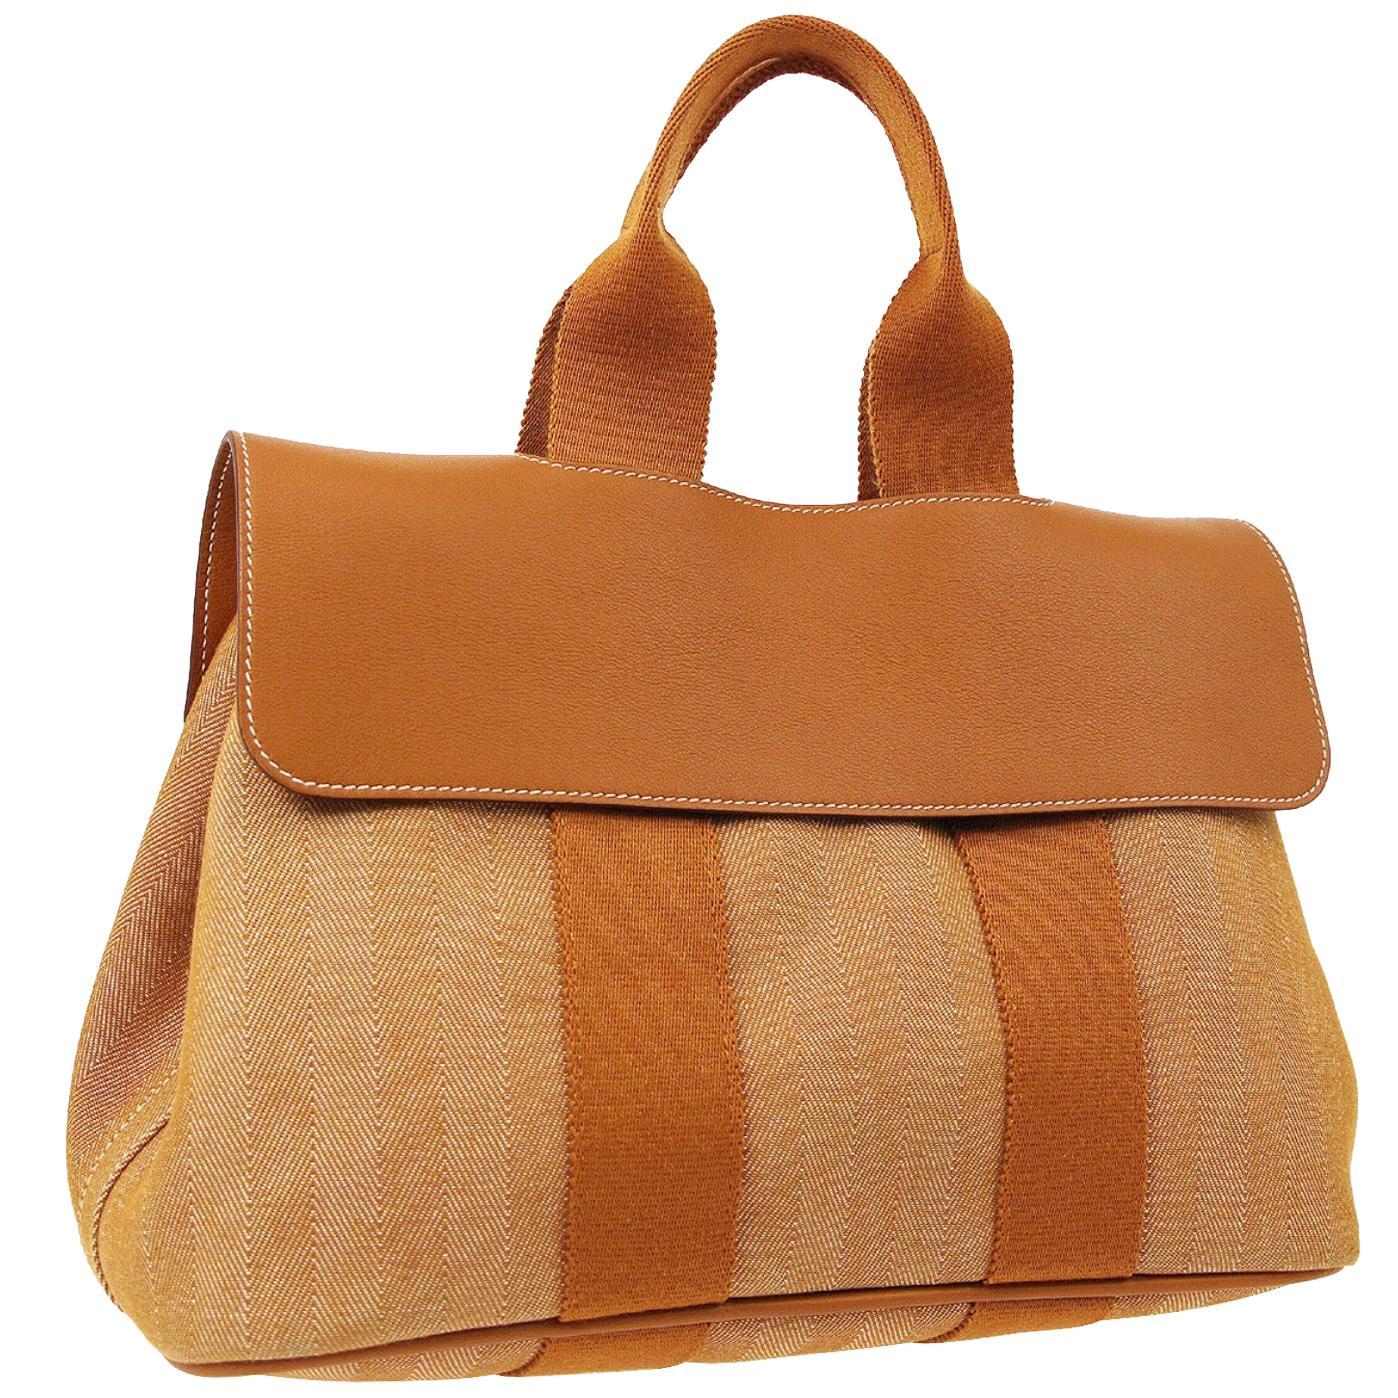 Hermes Two Tone Cognac Canvas Fabric Men's Women's Carryall Travel Tote Bag